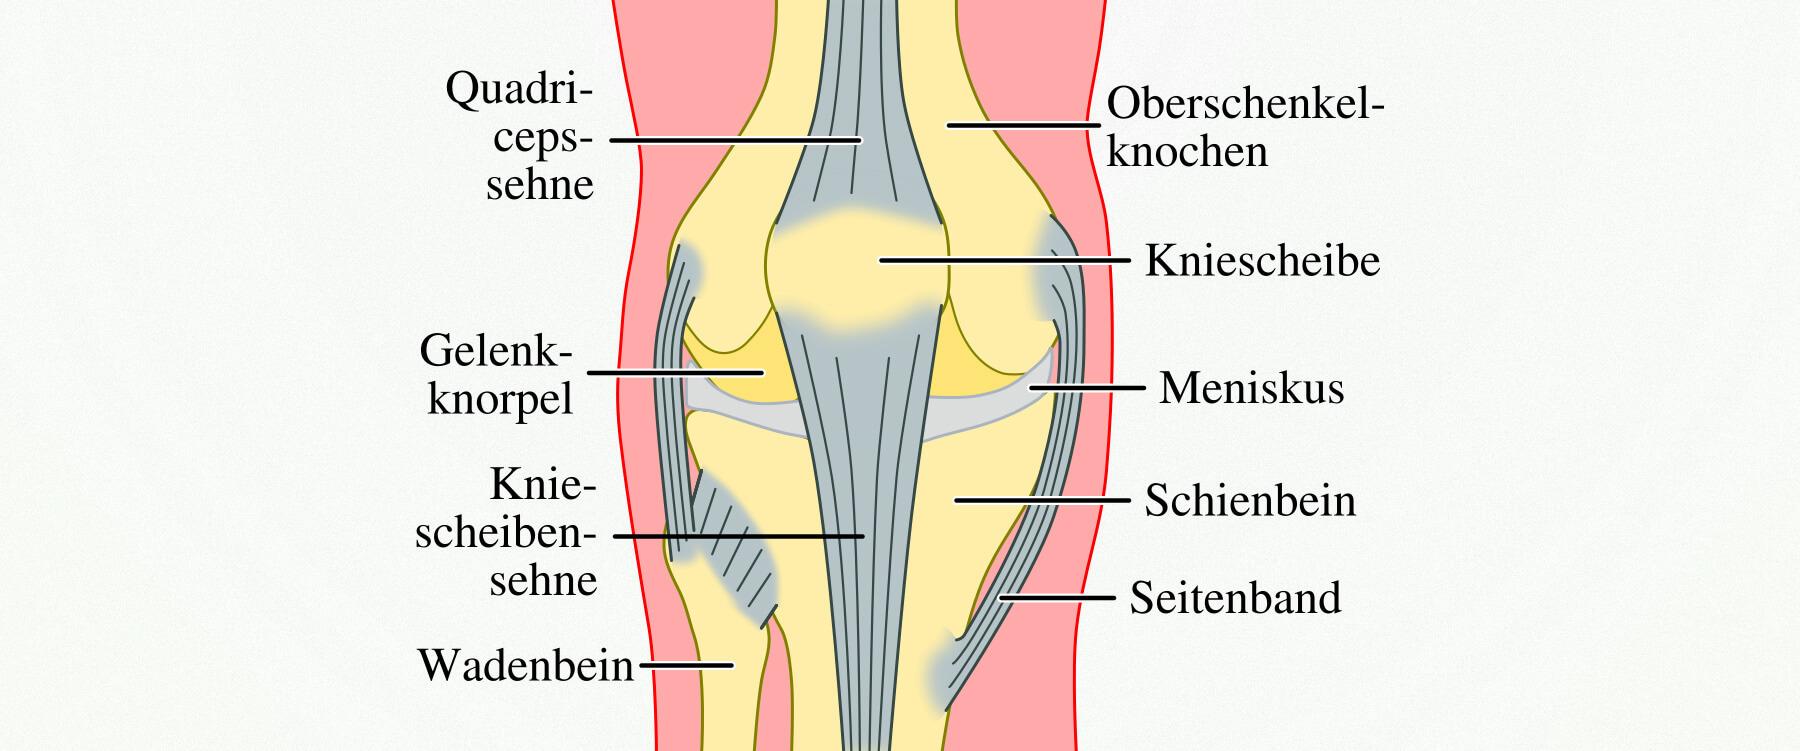 Charmant Sehnen In Knie Galerie - Anatomie Ideen - finotti.info